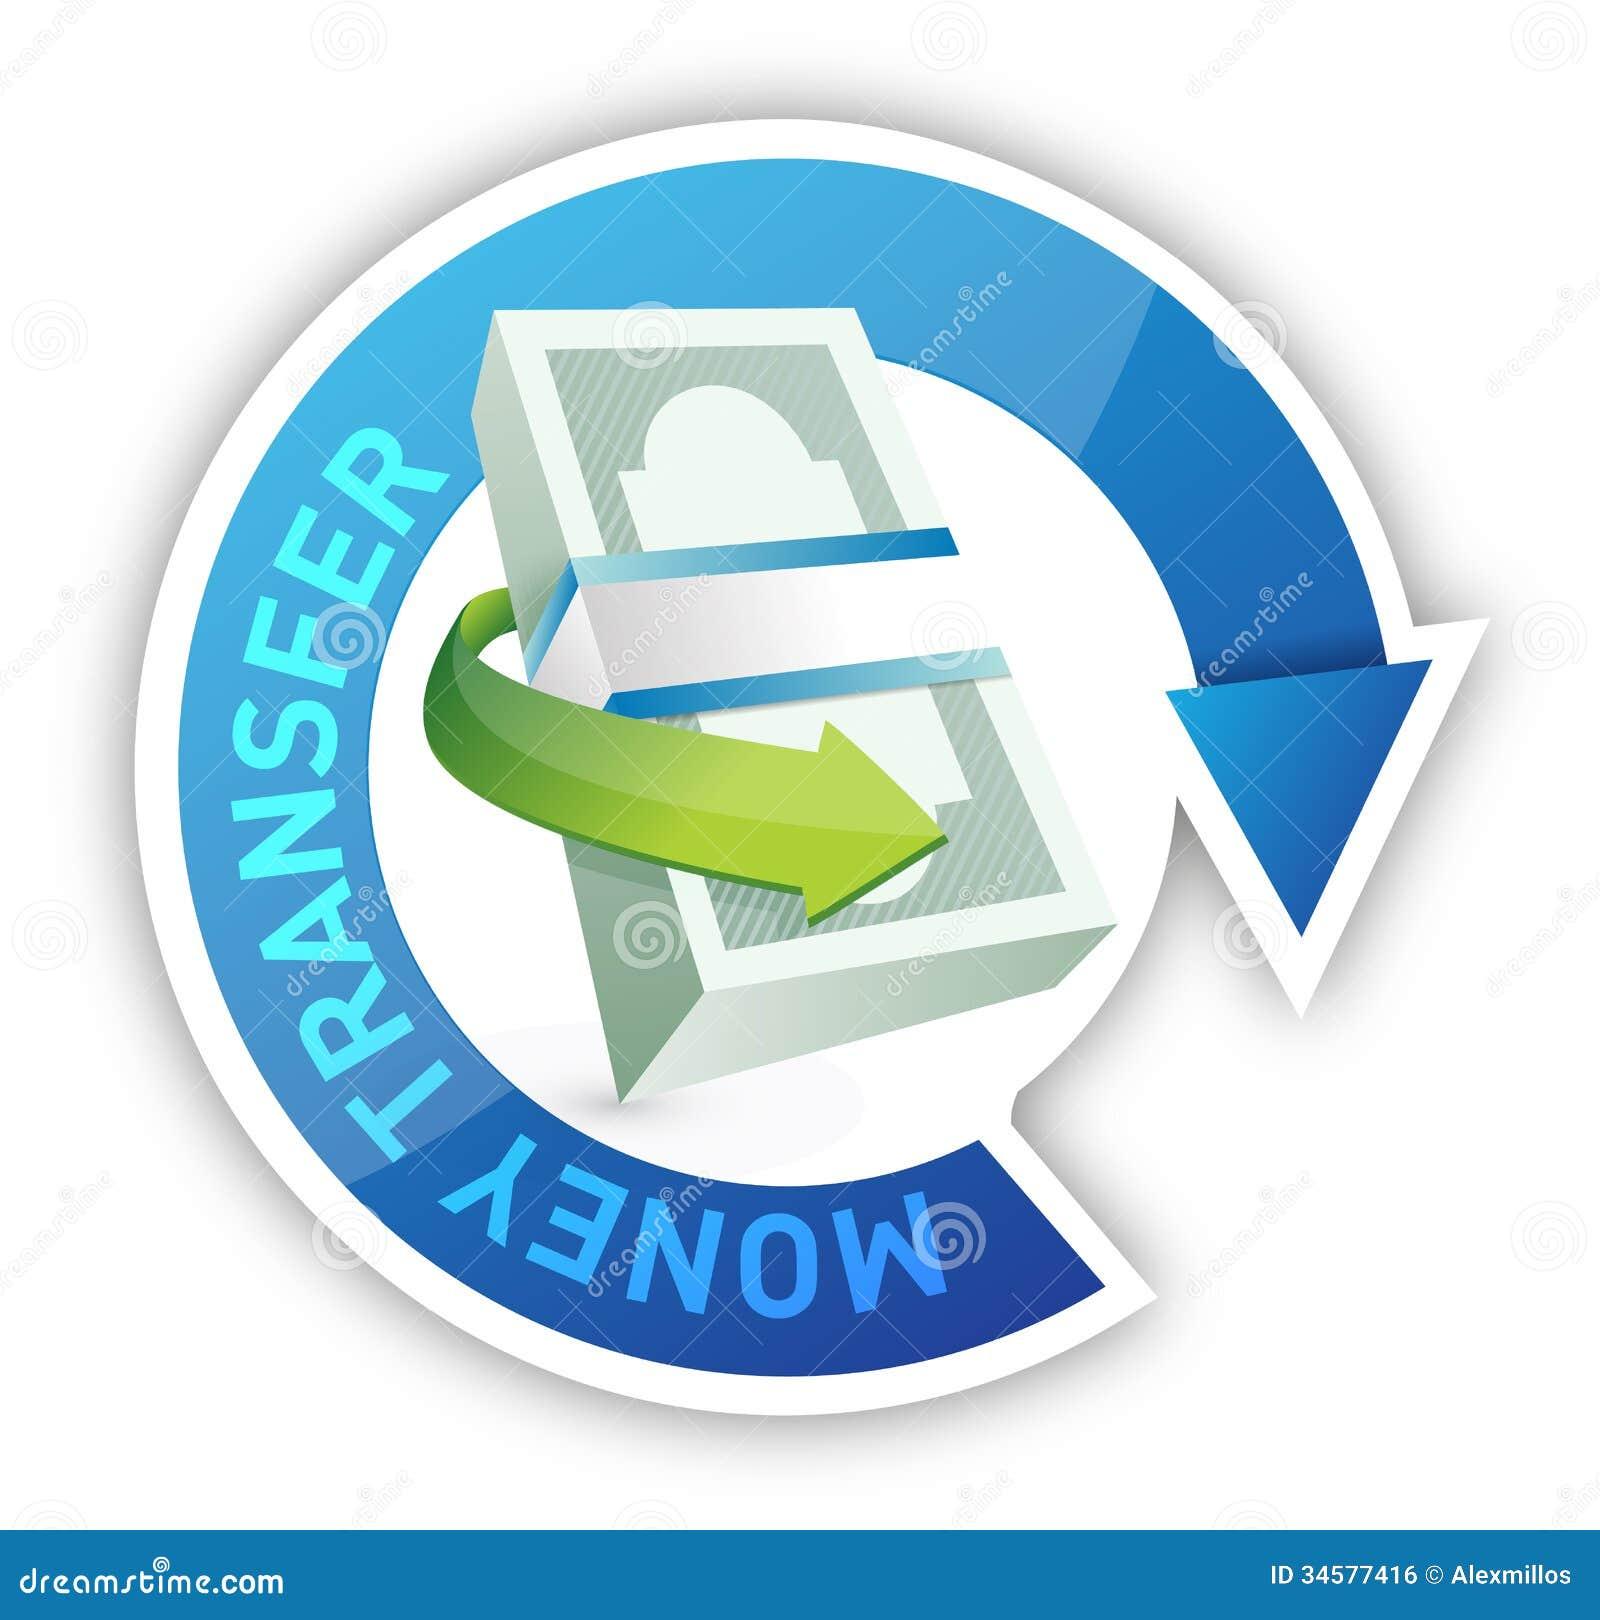 money transfer service business plan